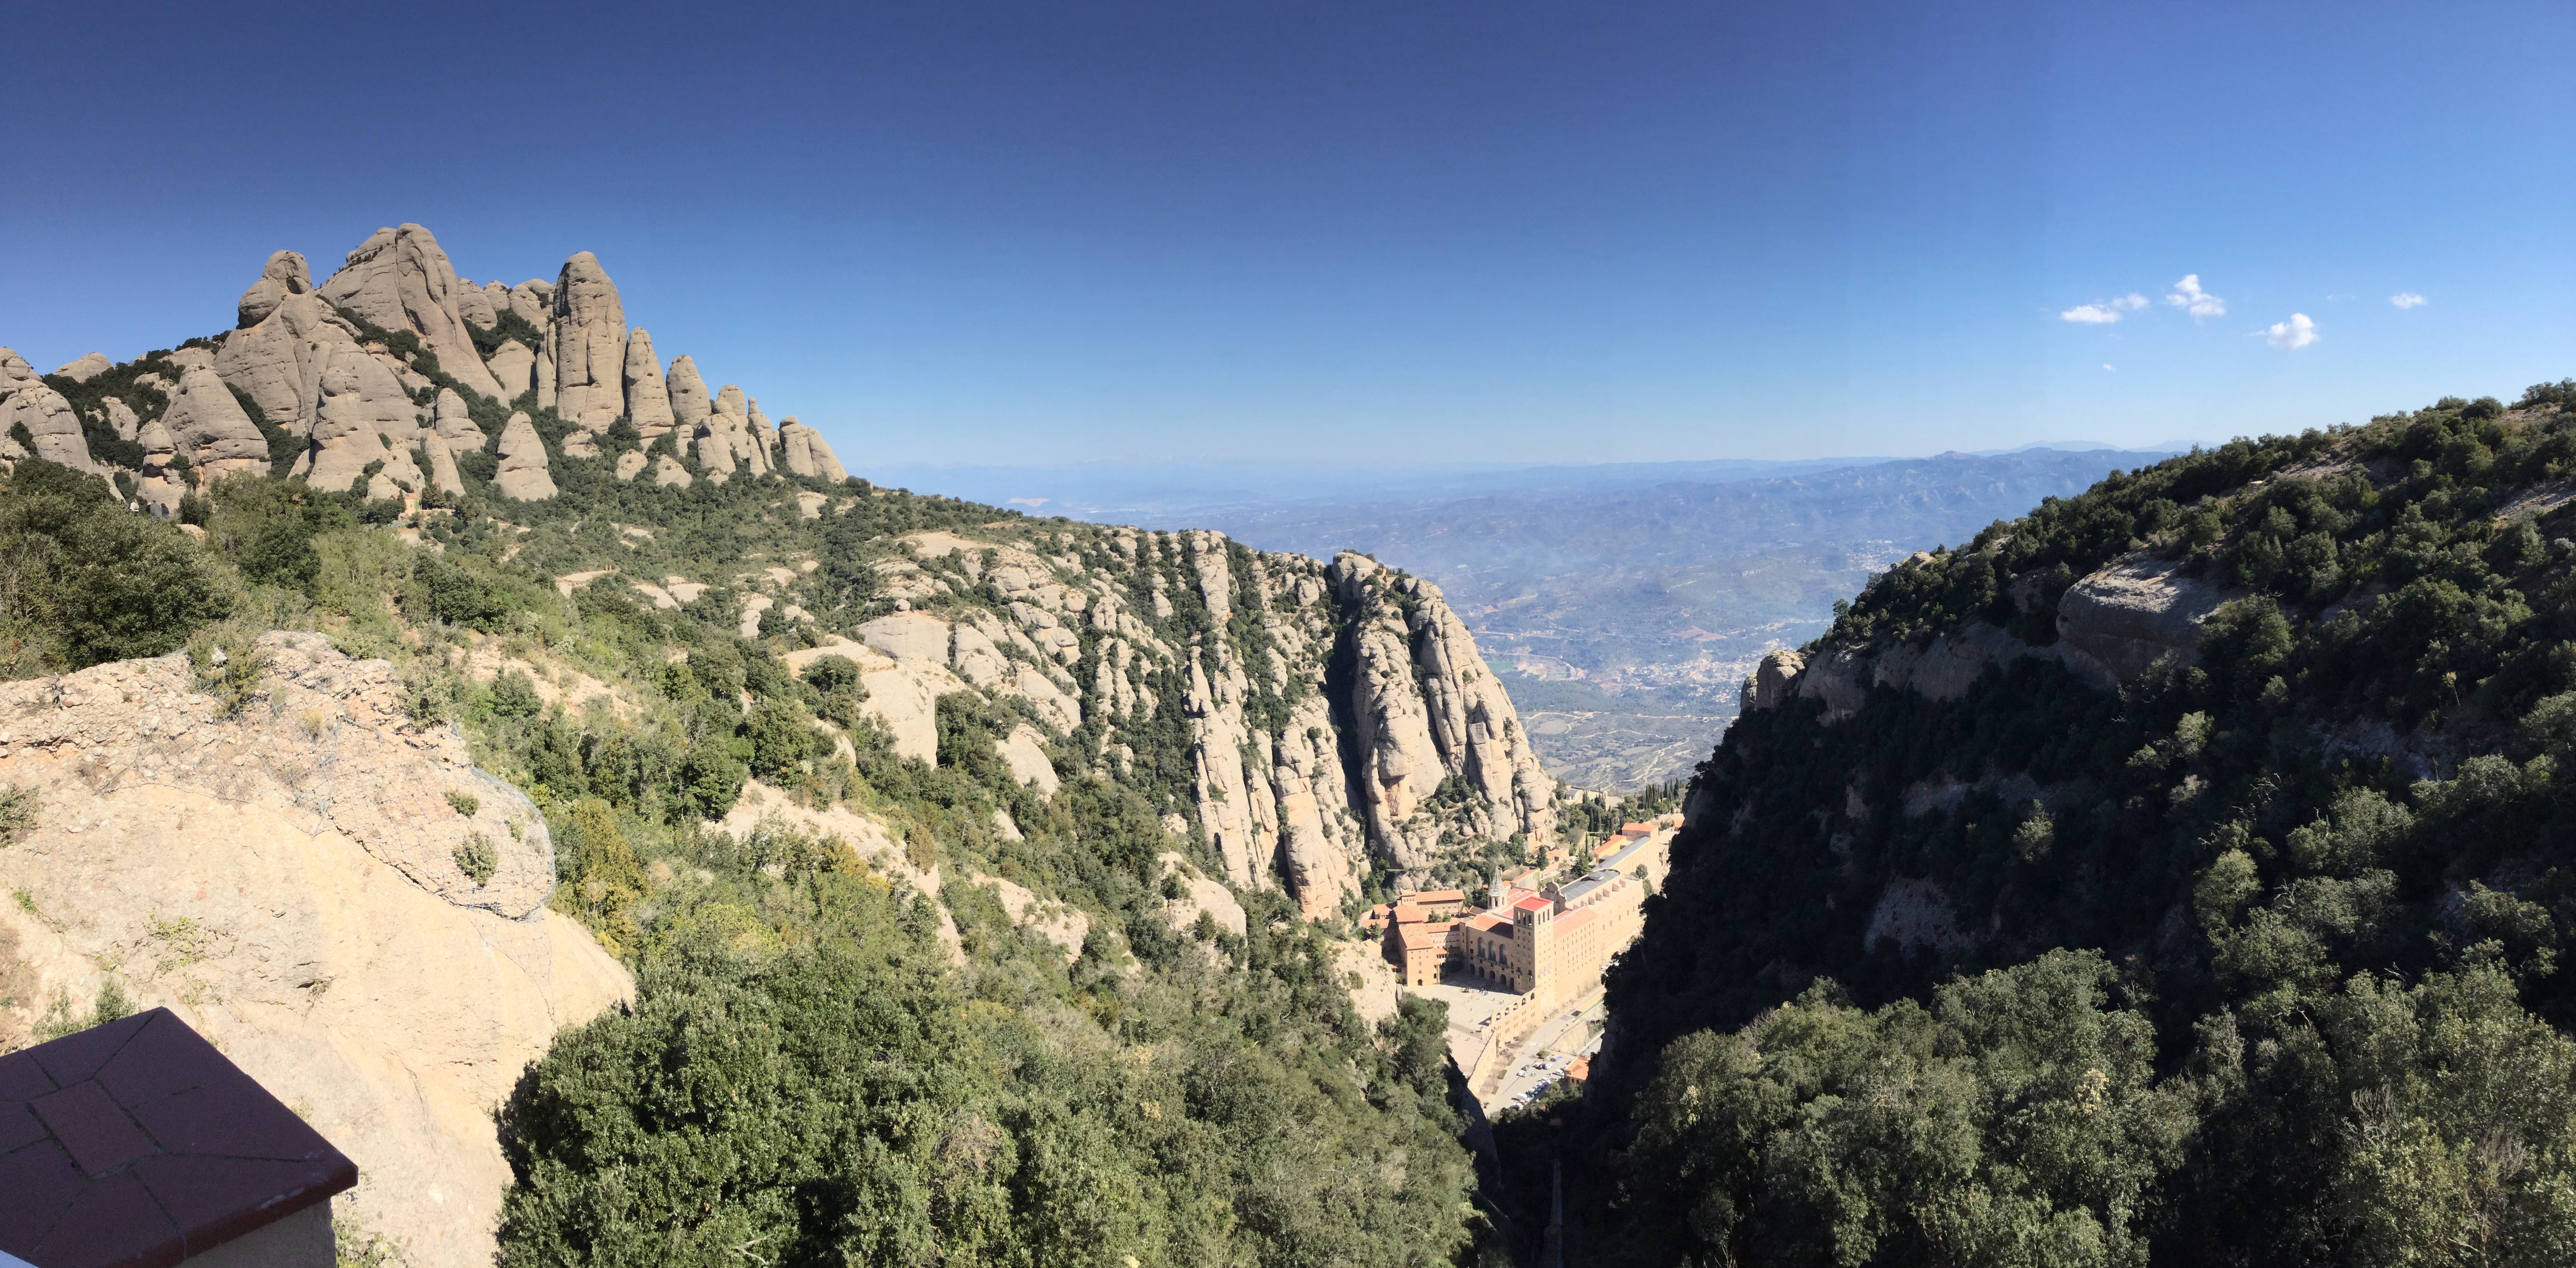 View of Montserrat Abbey. Photo by Julie Dodd